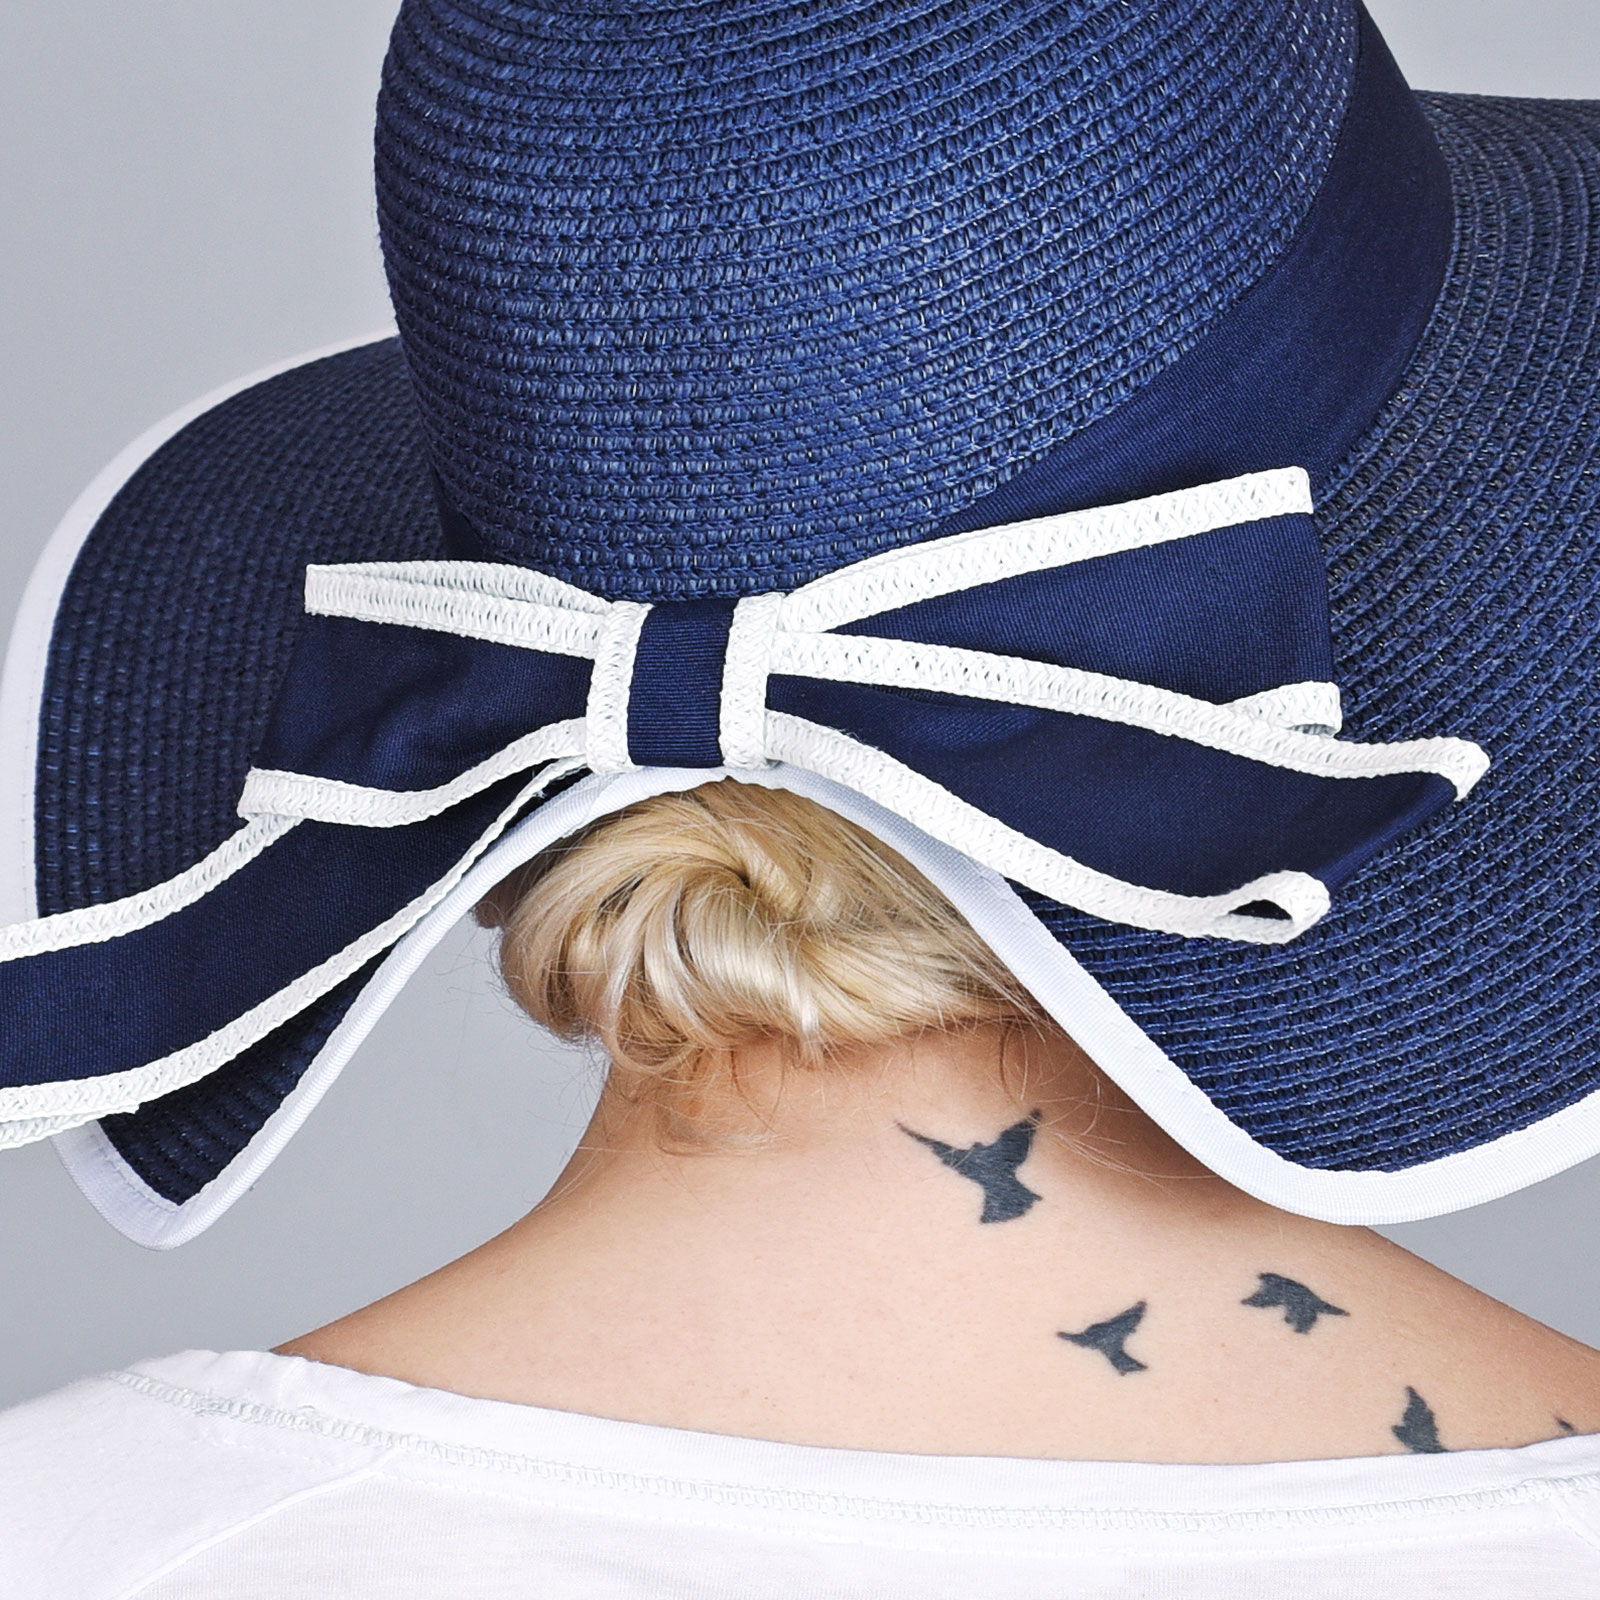 CP-00895-VF16-2-chapeau-femme-capeline-bleu-marine